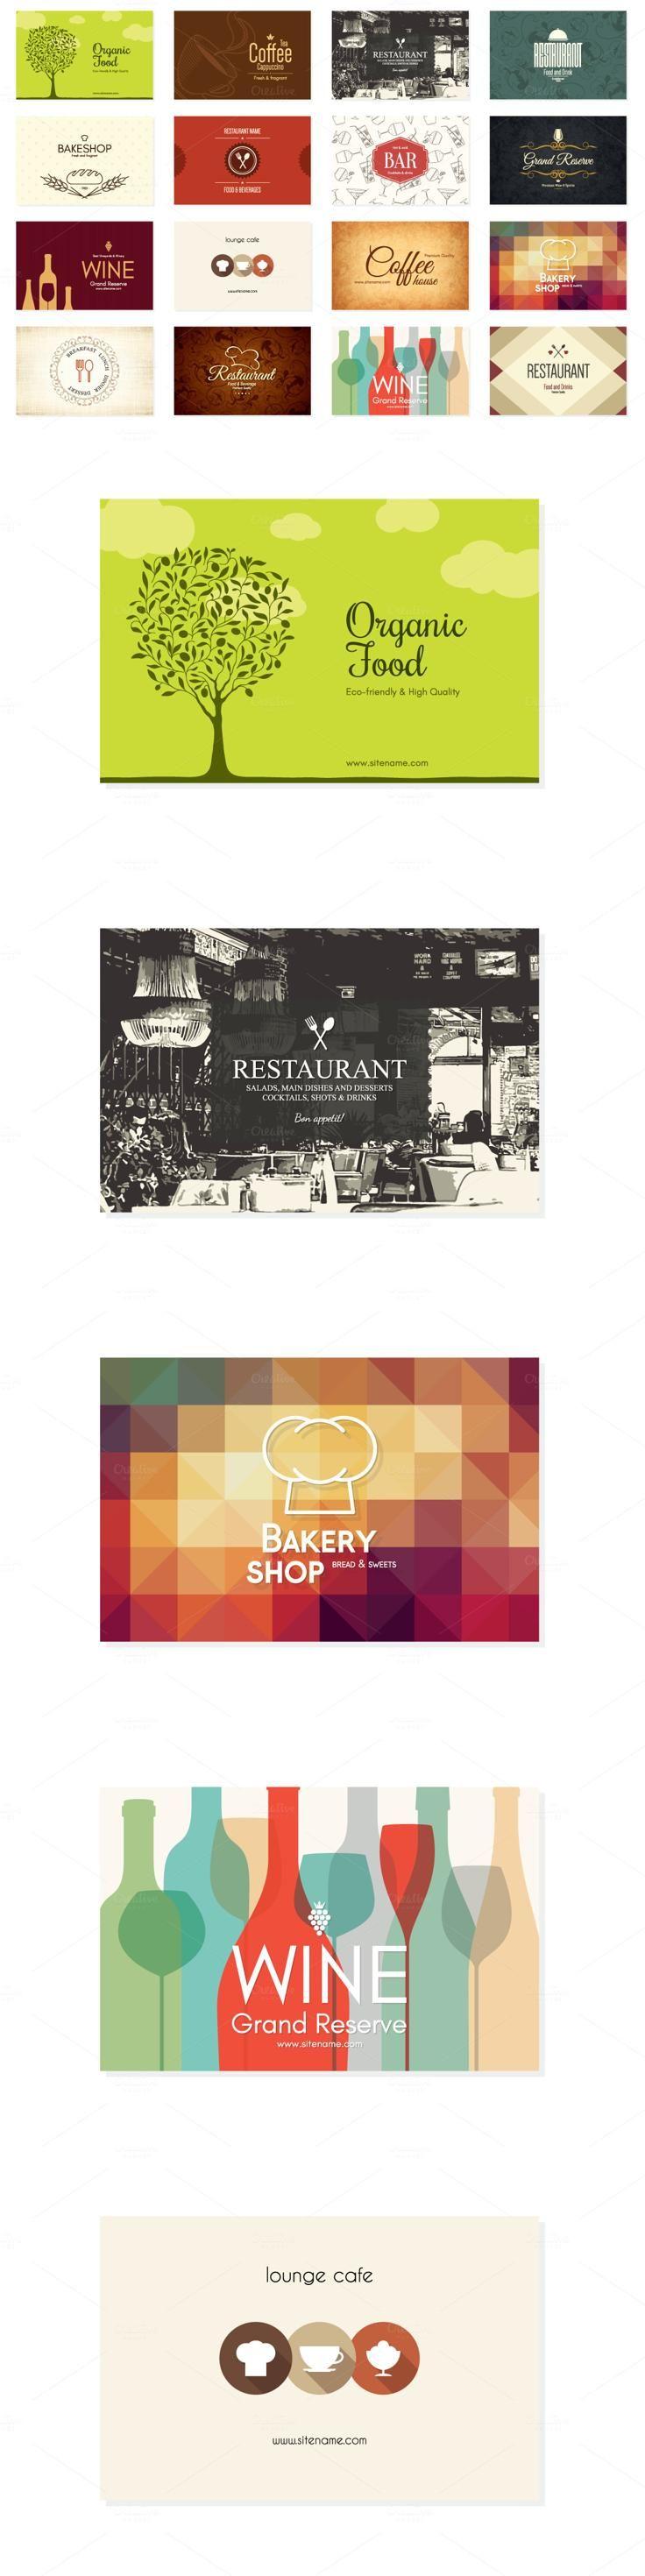 102 best business card images on pinterest lipsense business cards